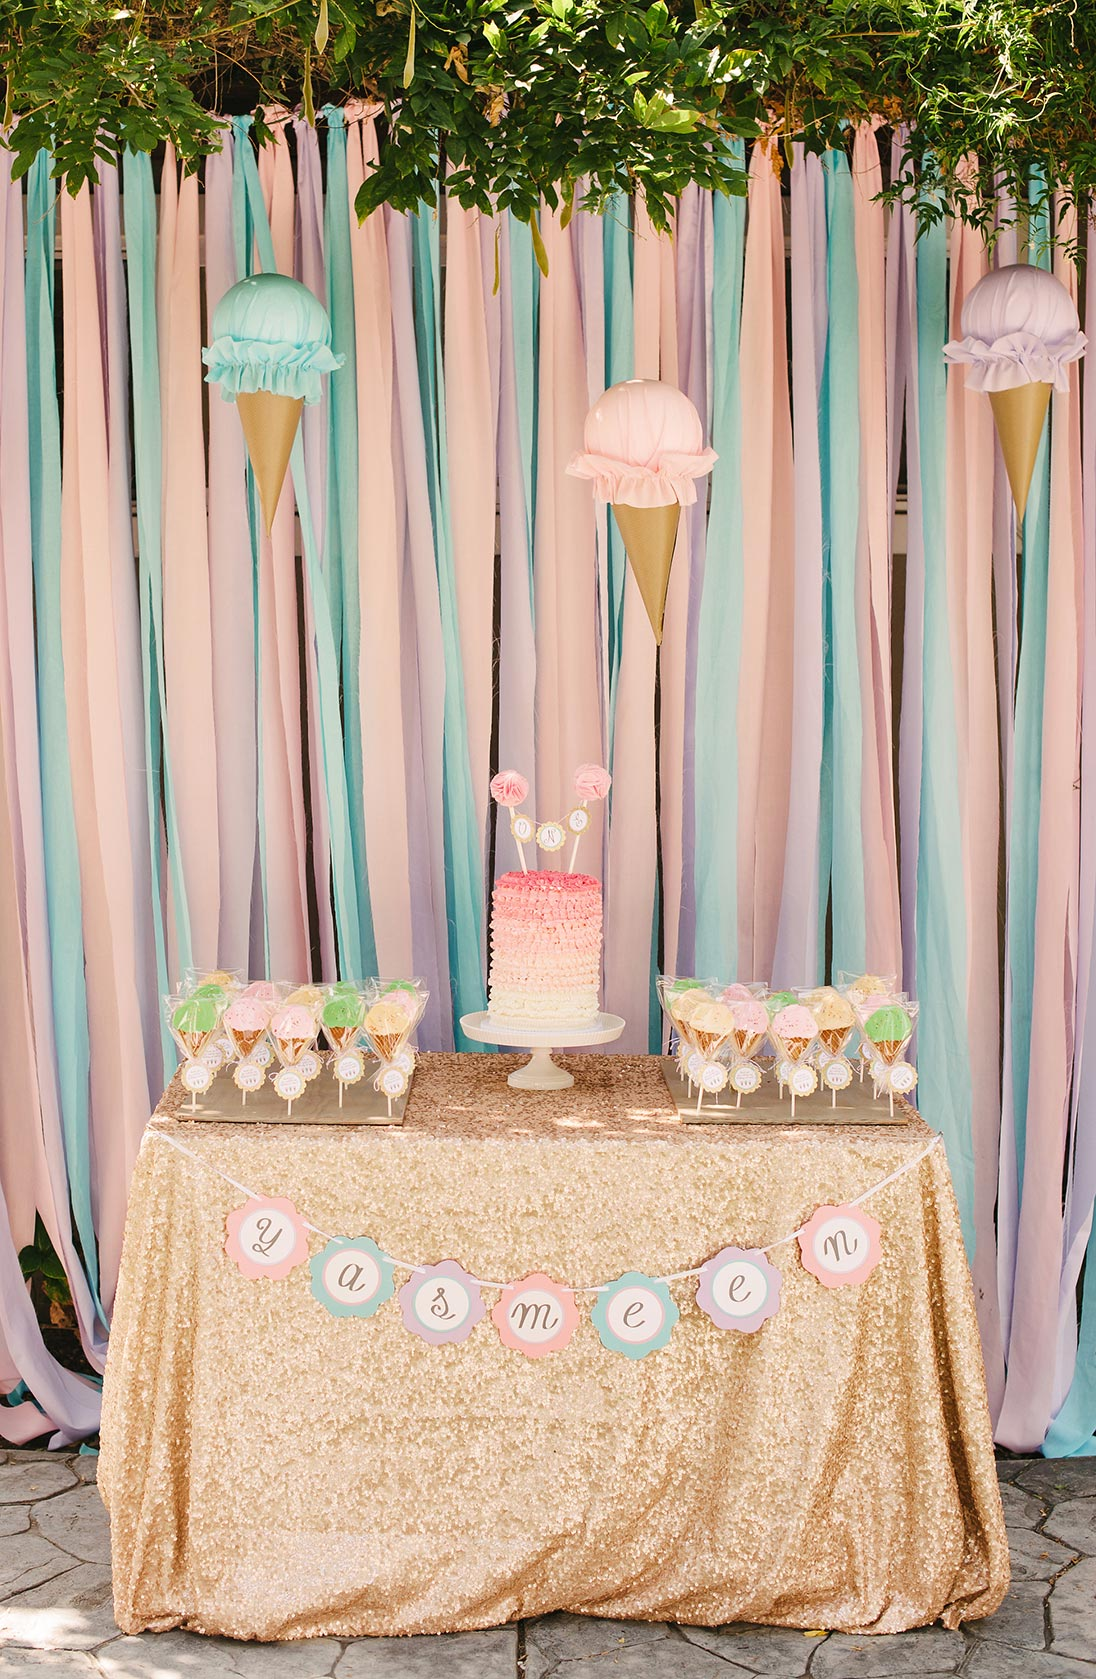 ice cream sweets table.jpg